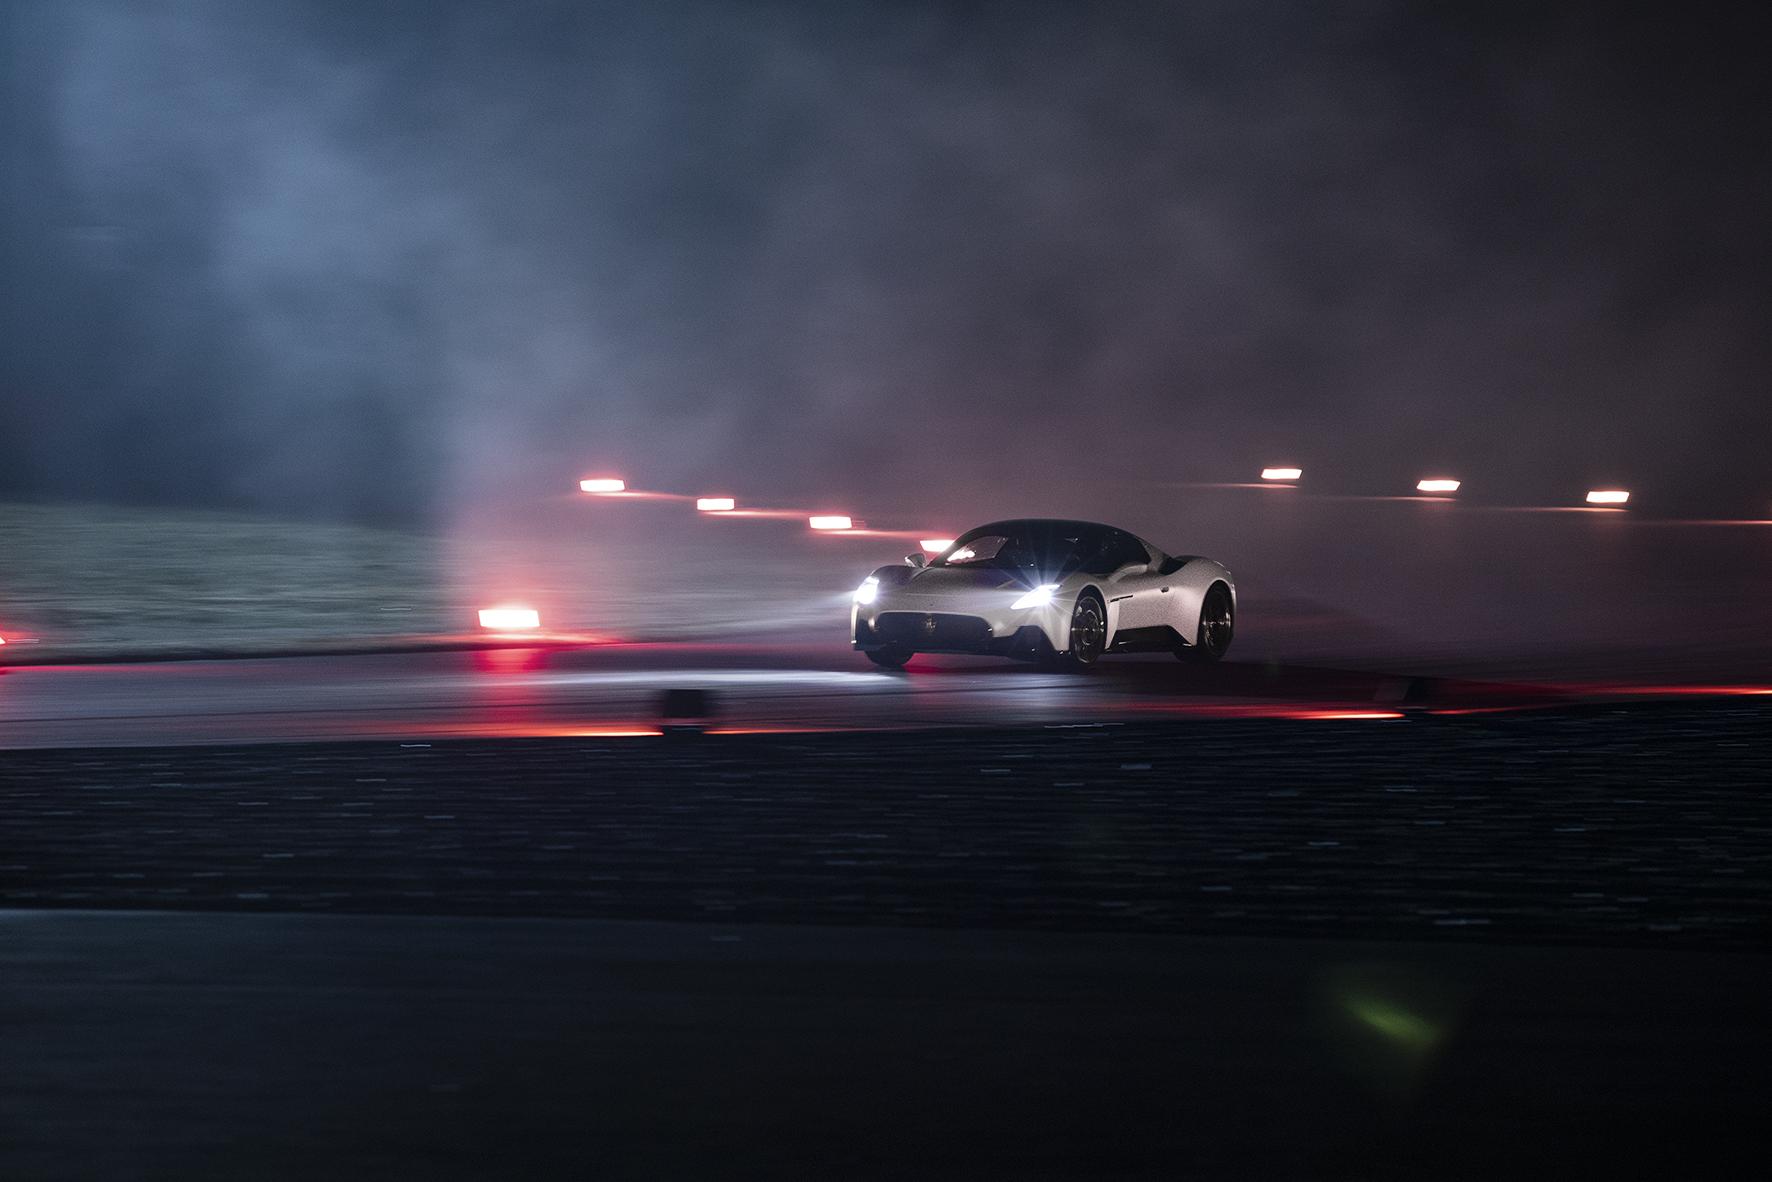 Maserati MC20 driving night time track